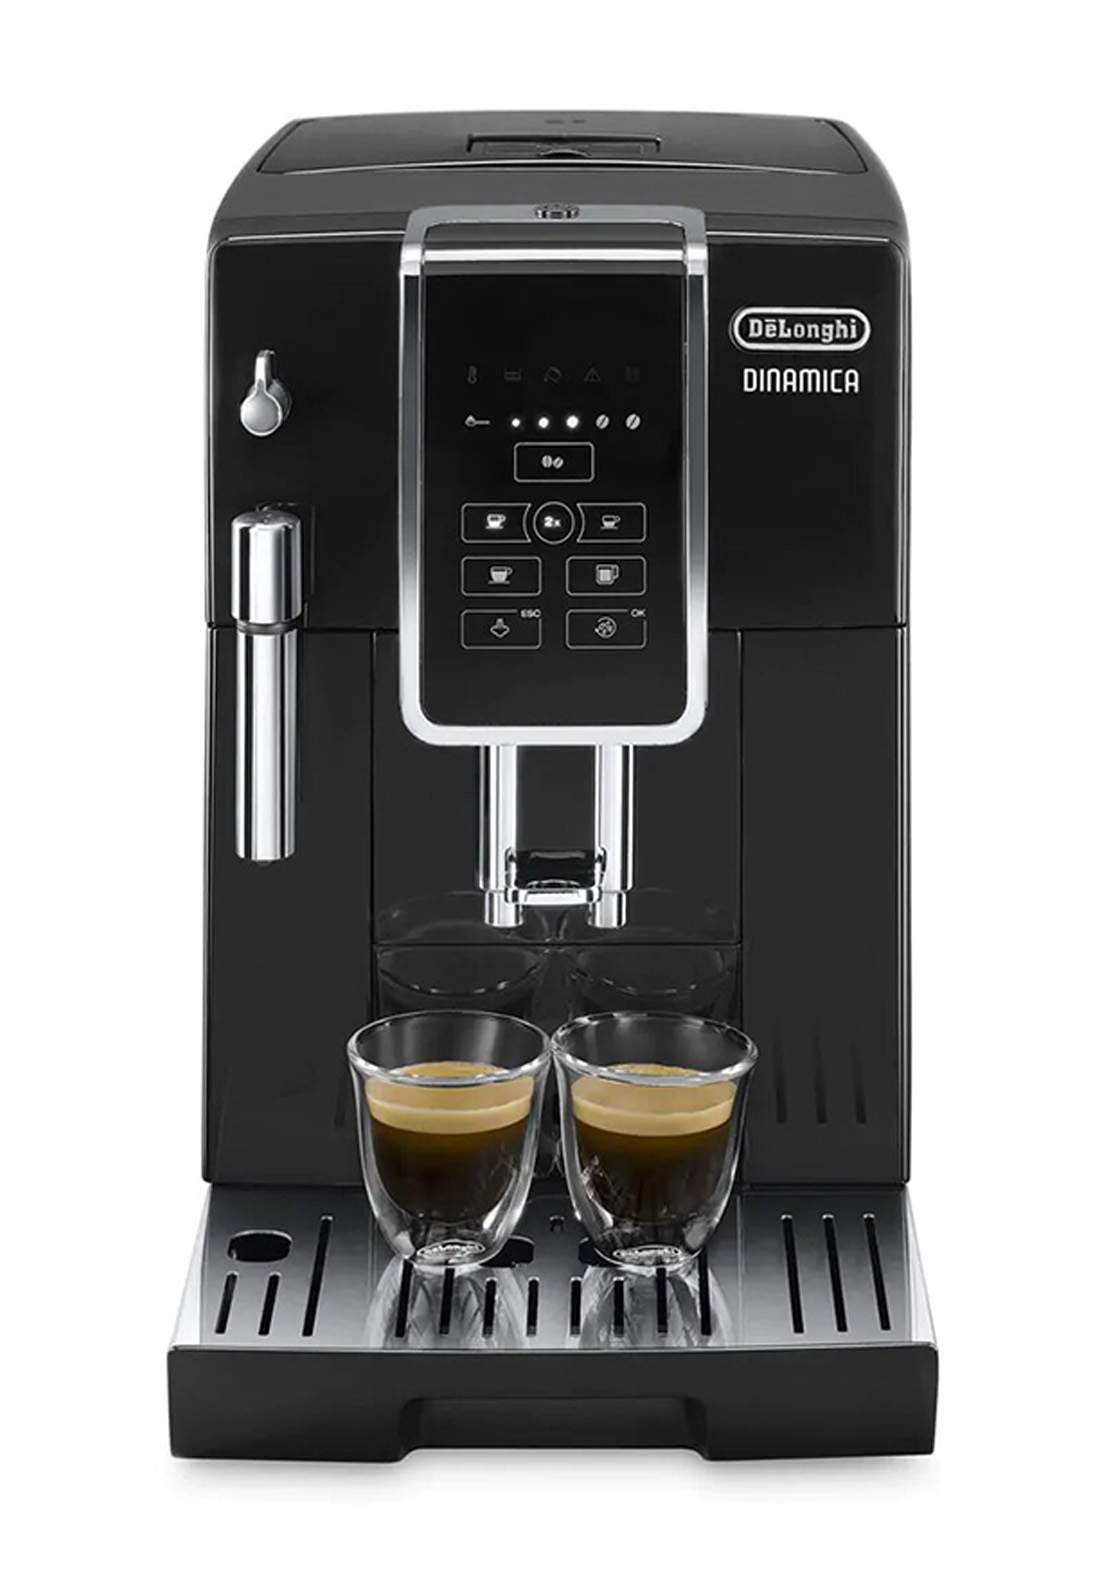 Delonghi ECAM350.15B Coffee Machine 1450 Watt ماكنة صنع قهوة